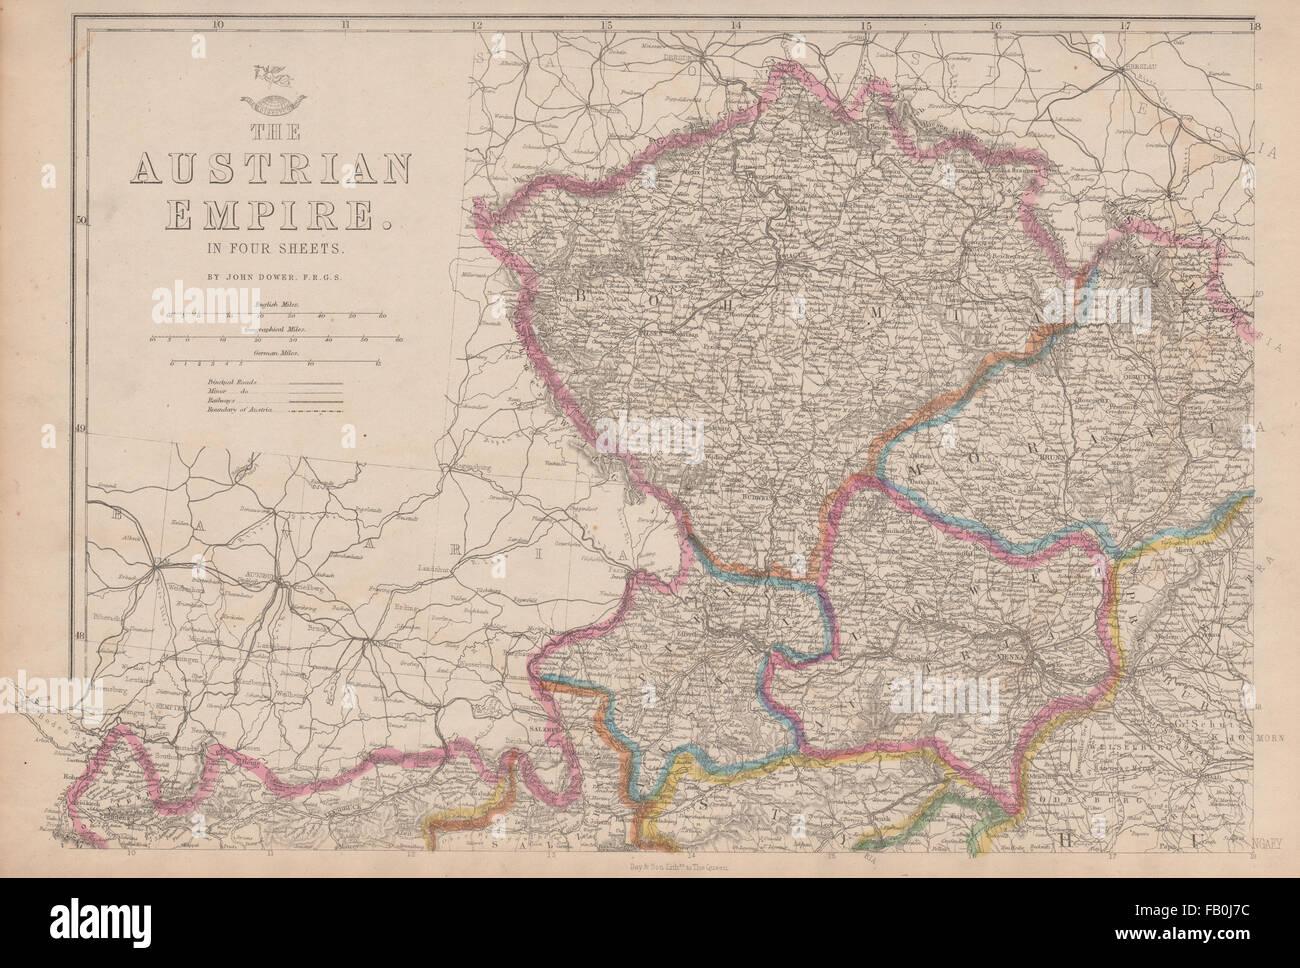 Vienna Treasures of the Danube River